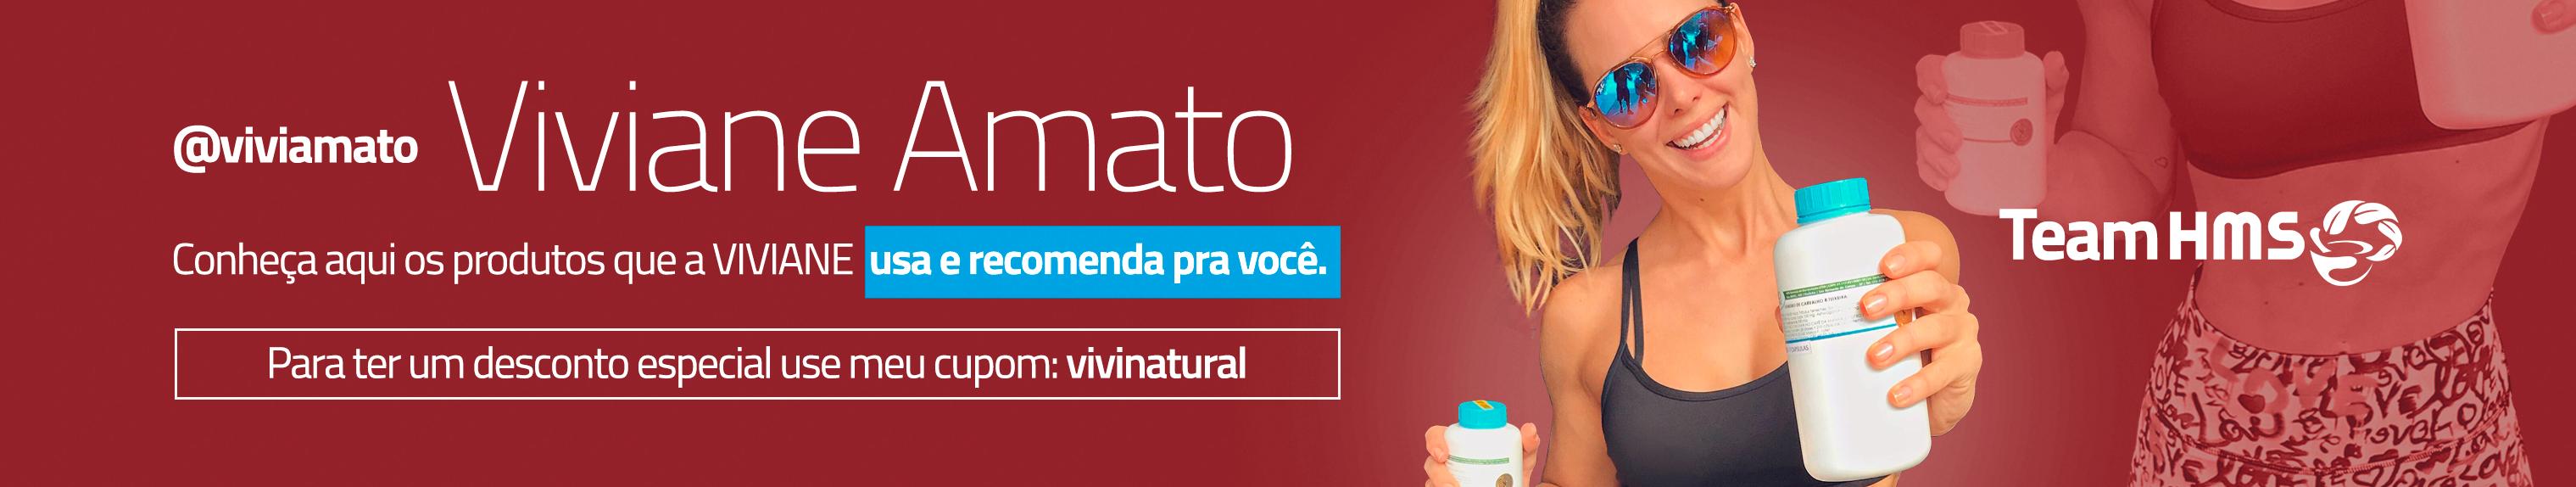 banner Viviane Amato